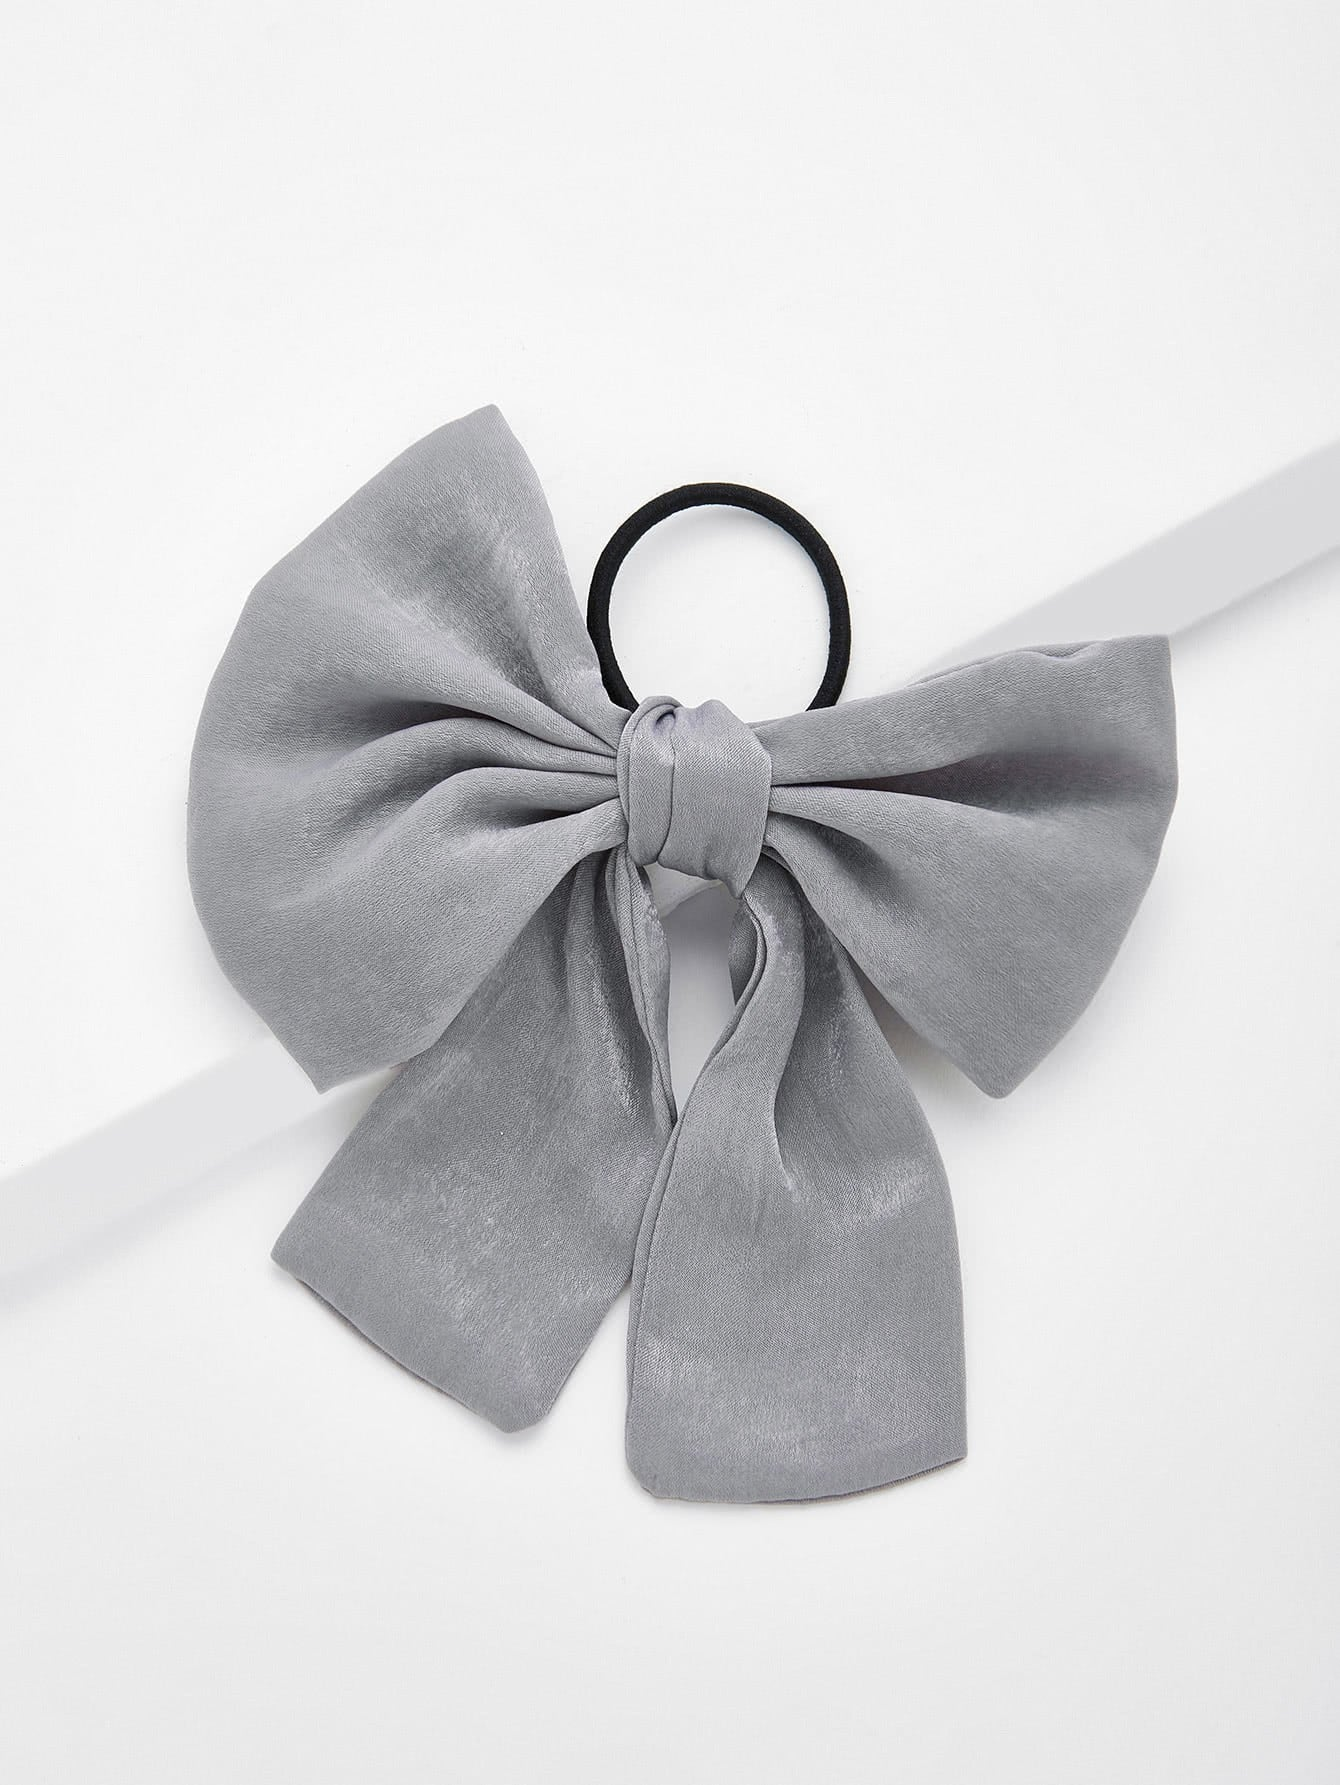 Bow Tie Design Hair Tie hair tie 3pcs